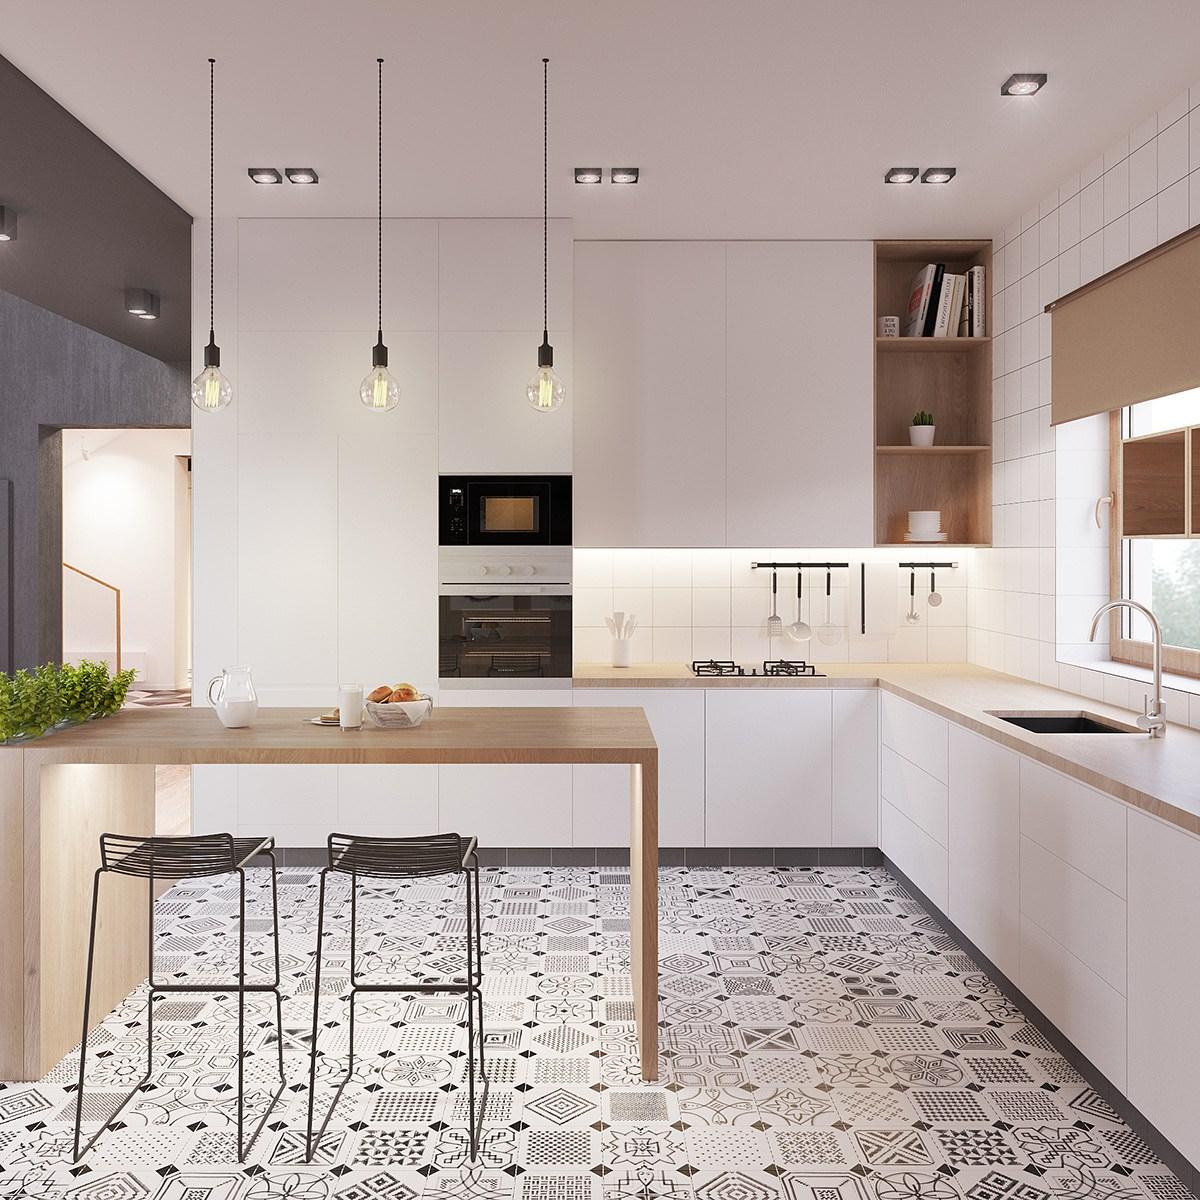 Arredamento Stile Nordico Moderno.Originale Appartamento In Stile Scandinavo Moderno Ed Elegante